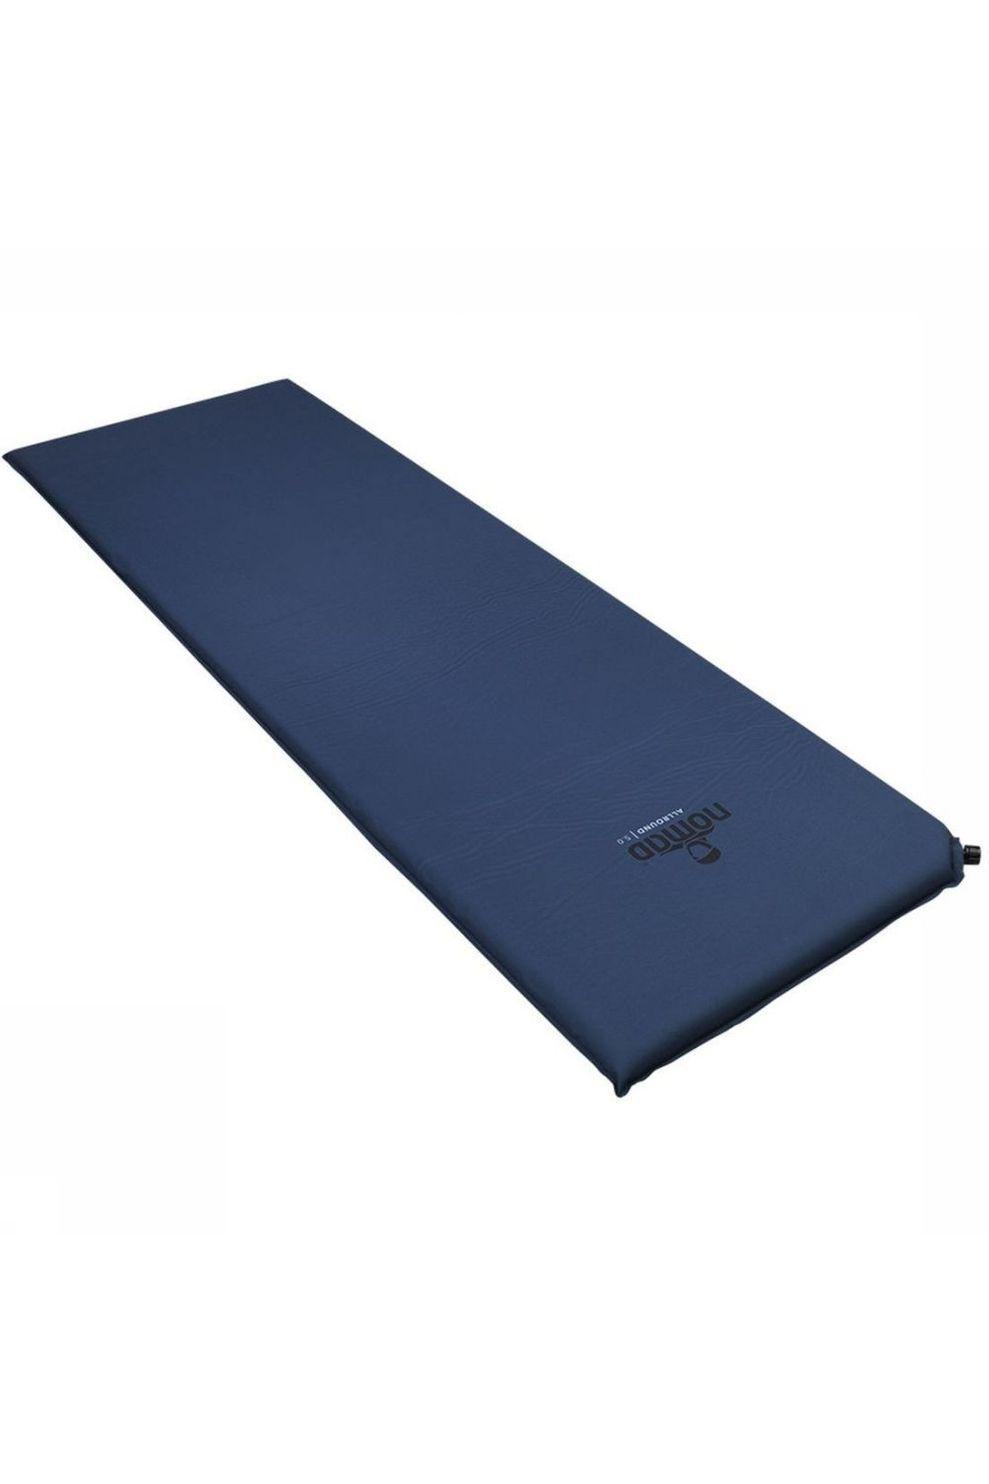 Nomad Slaapmat Allround 5.0 - Blauw